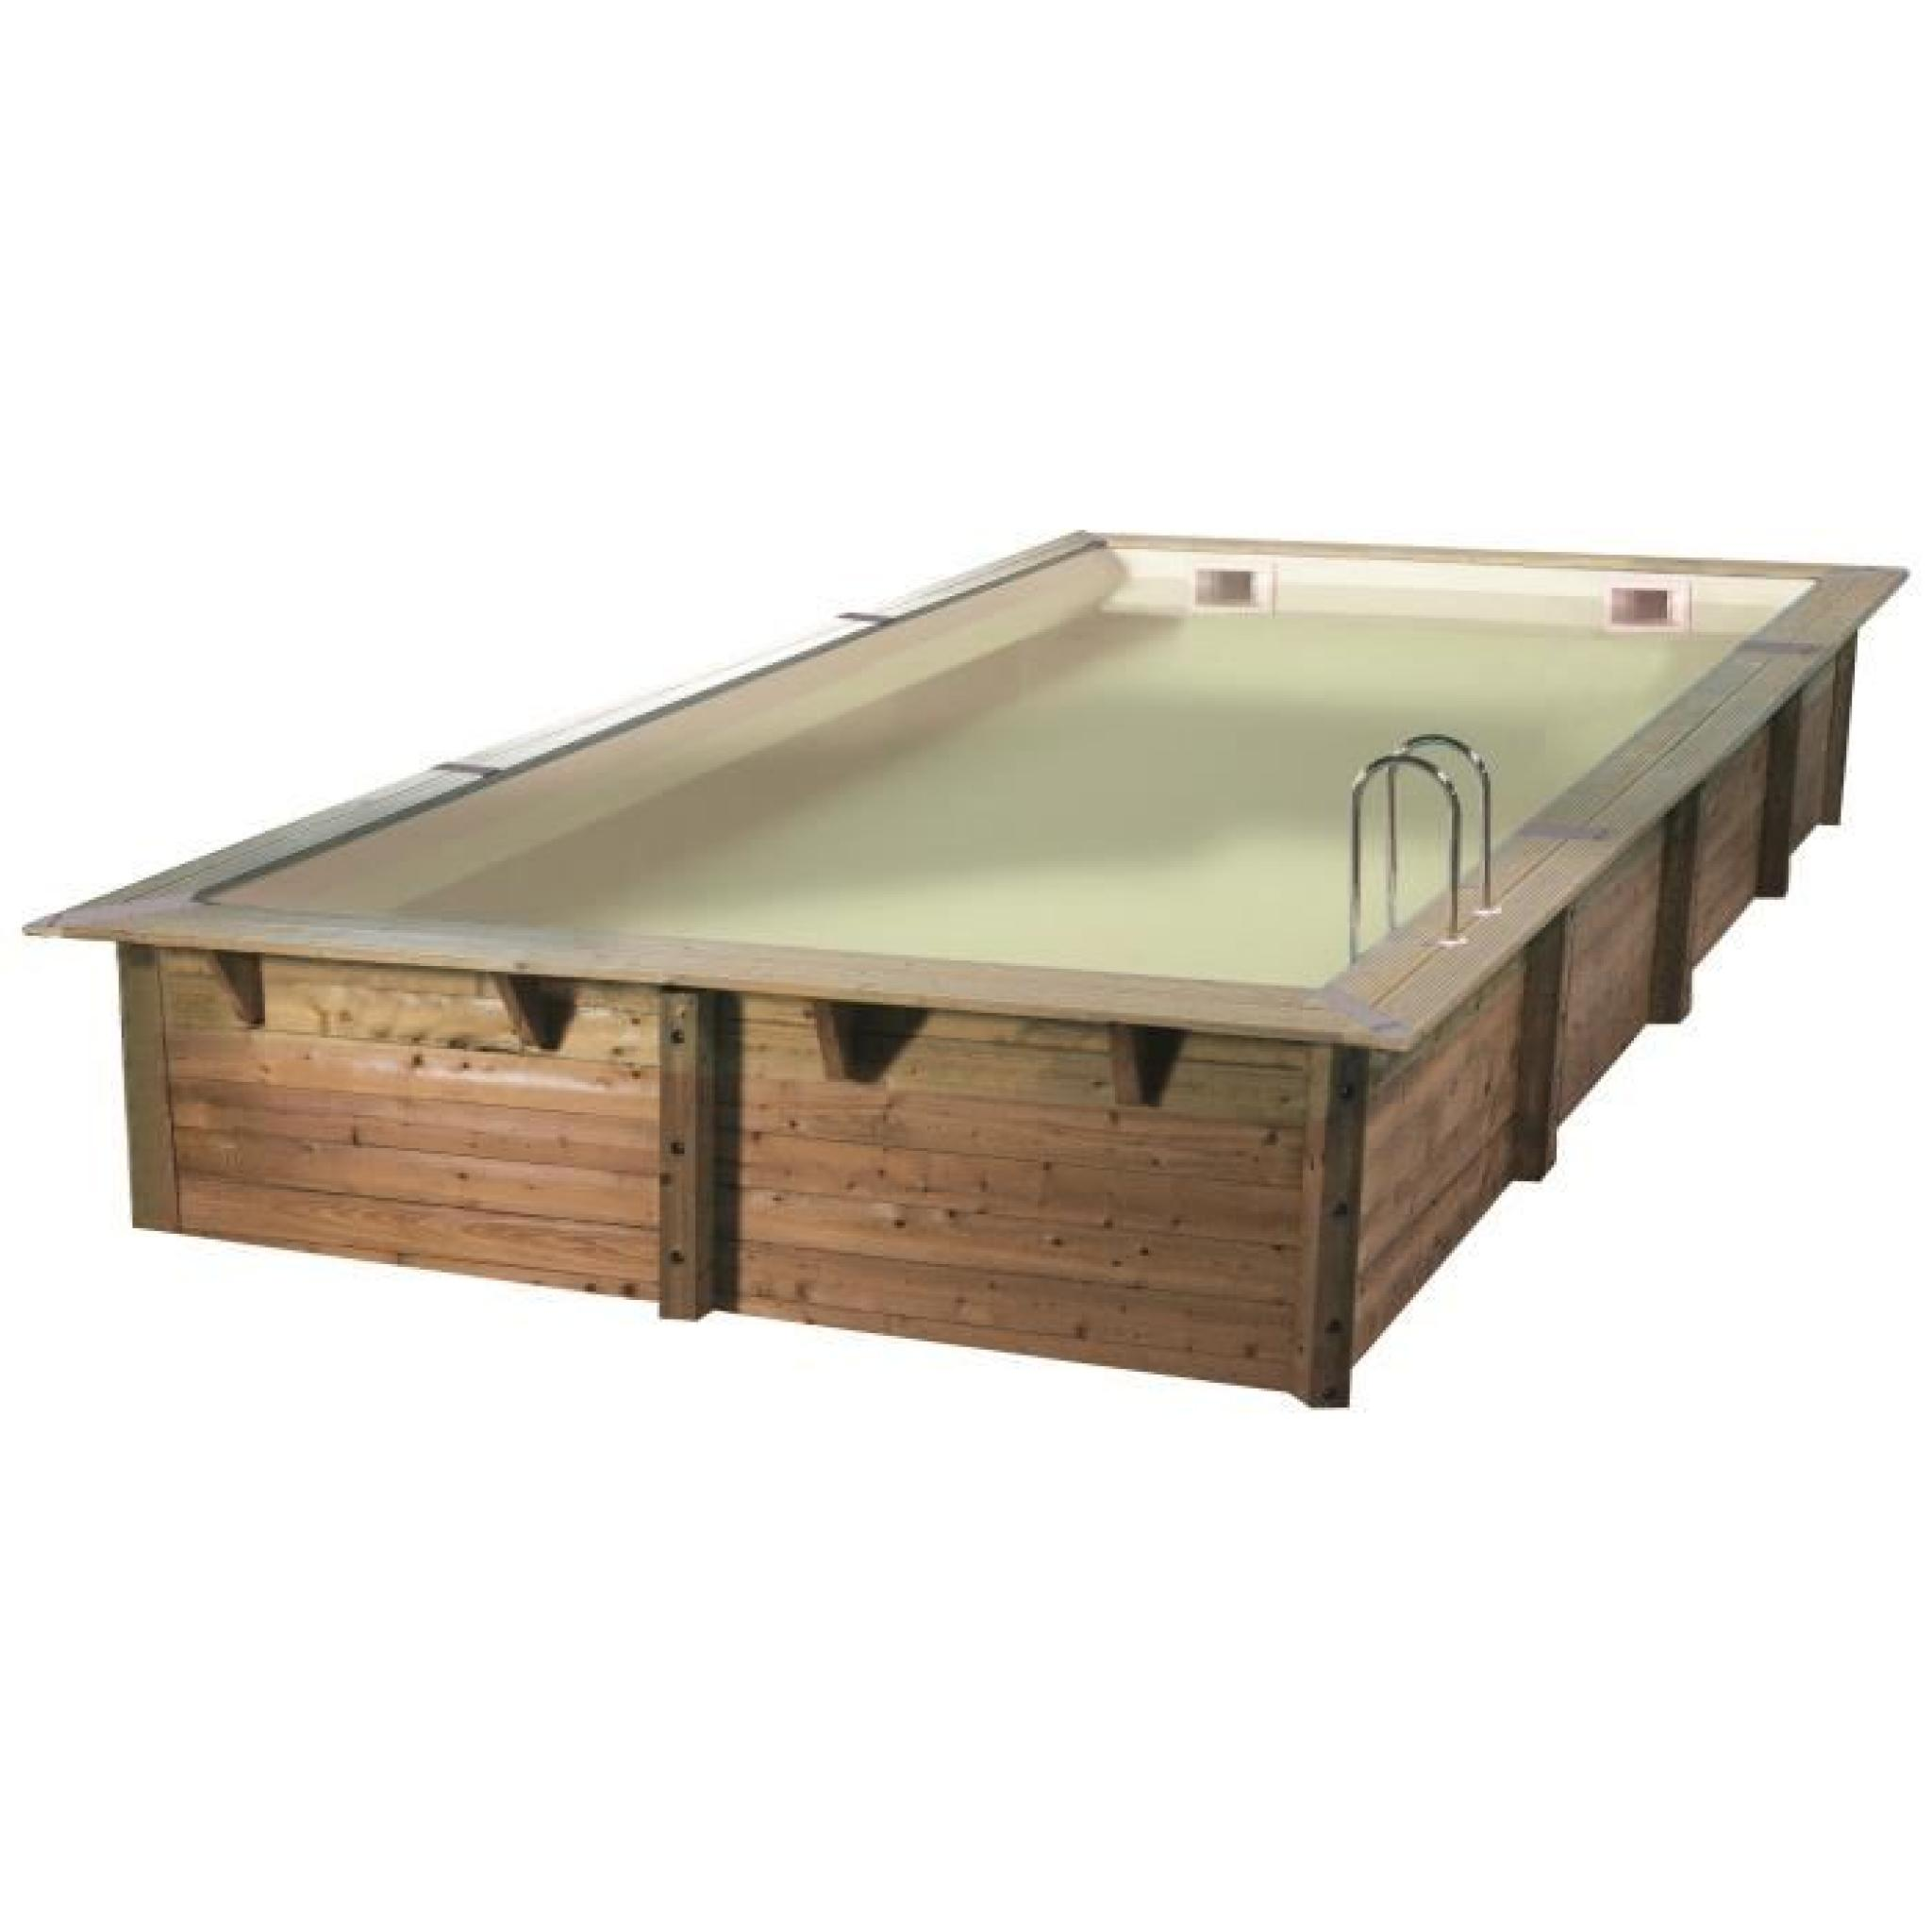 ubbink piscine octogonale en bois lin a 350x650xh140 cm liner sable achat vente piscine en. Black Bedroom Furniture Sets. Home Design Ideas